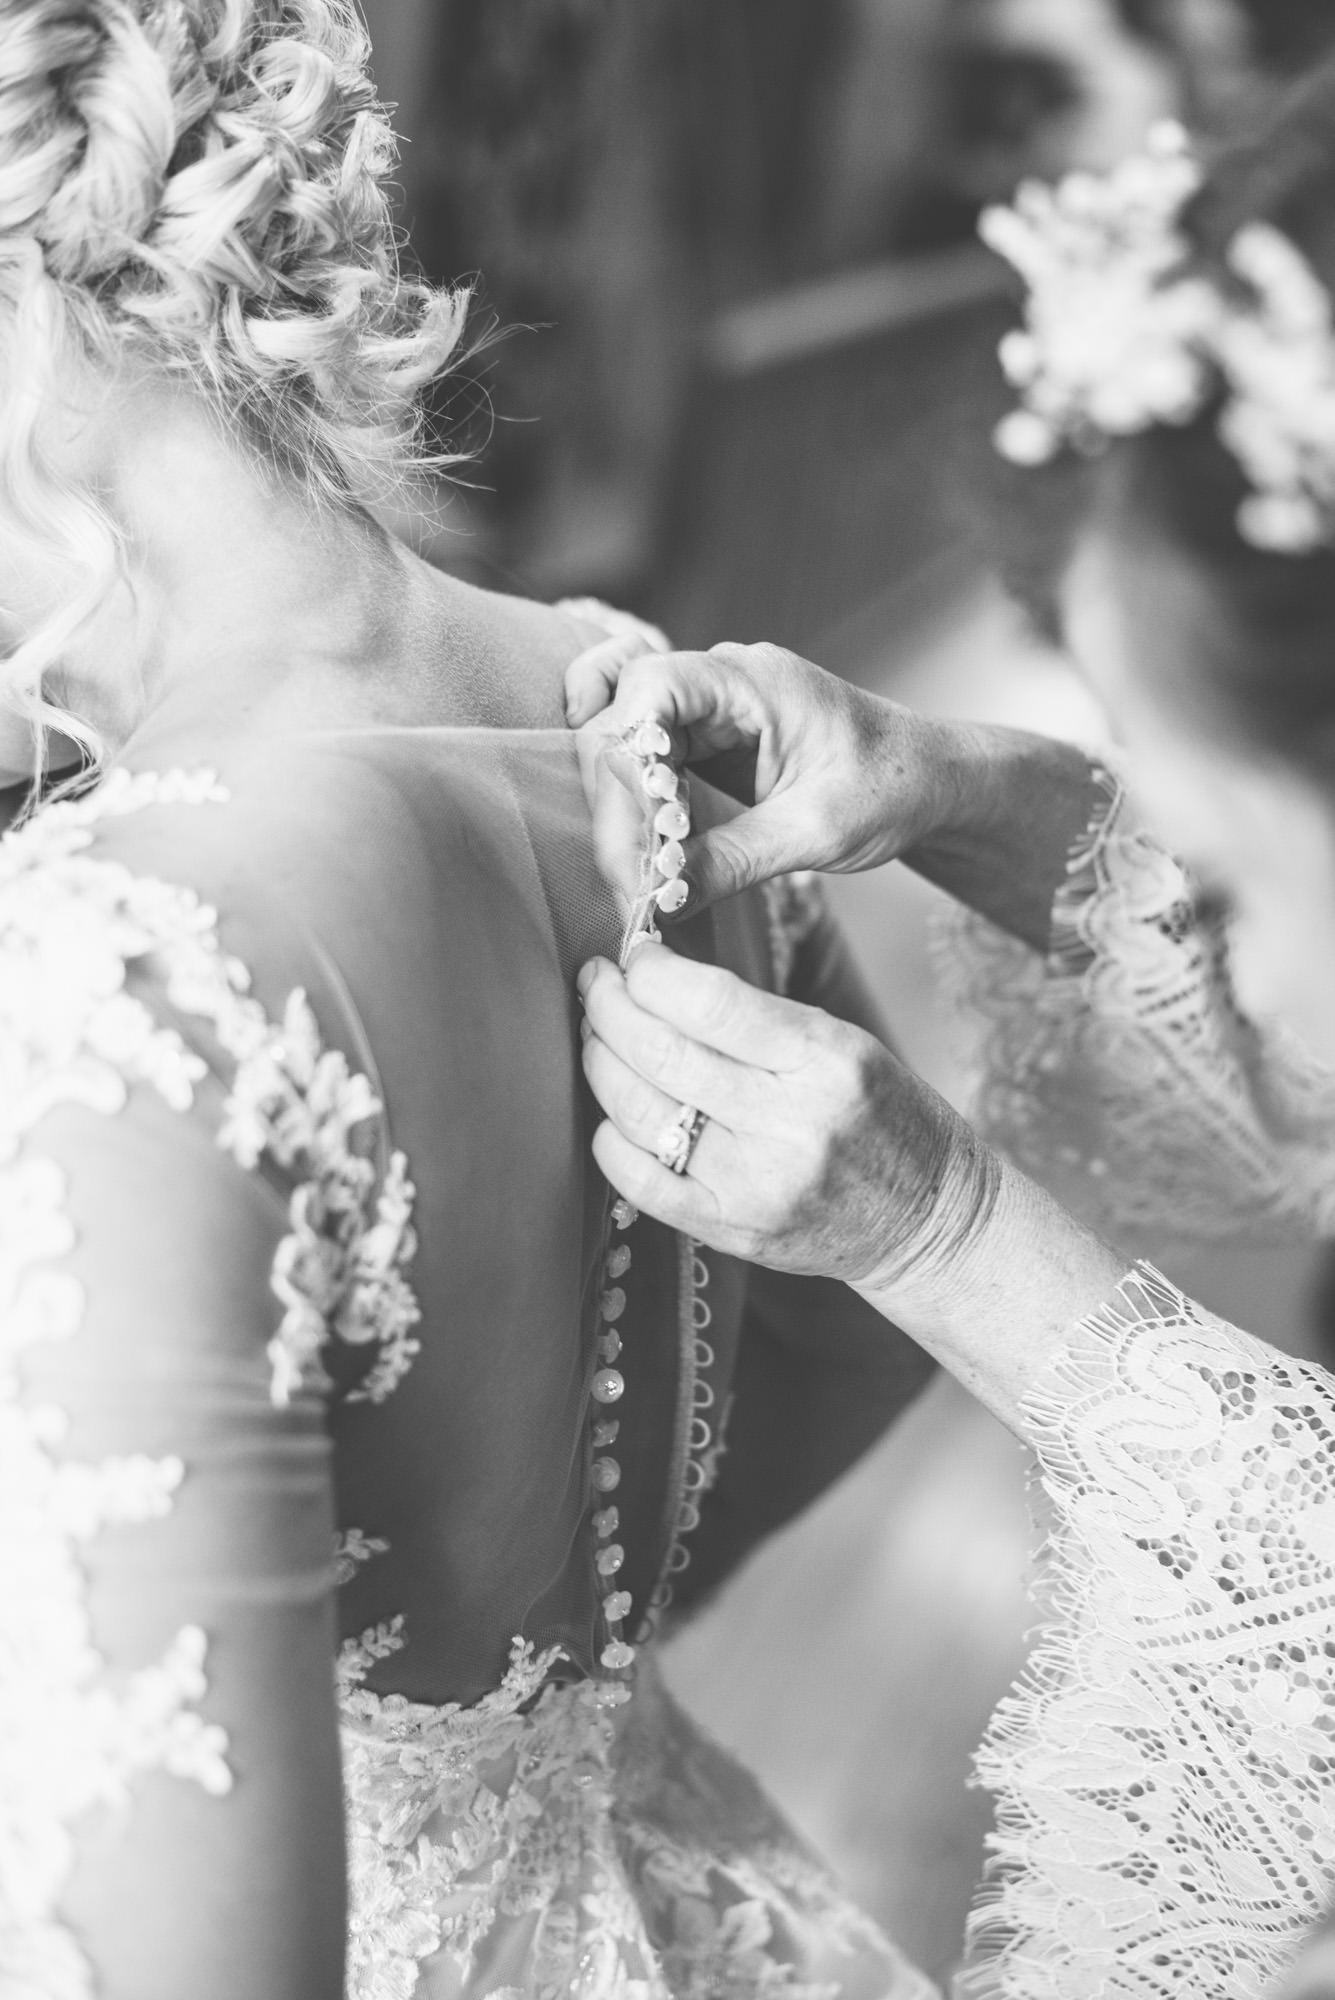 junebird-photography-wedding-photographer-6.jpg